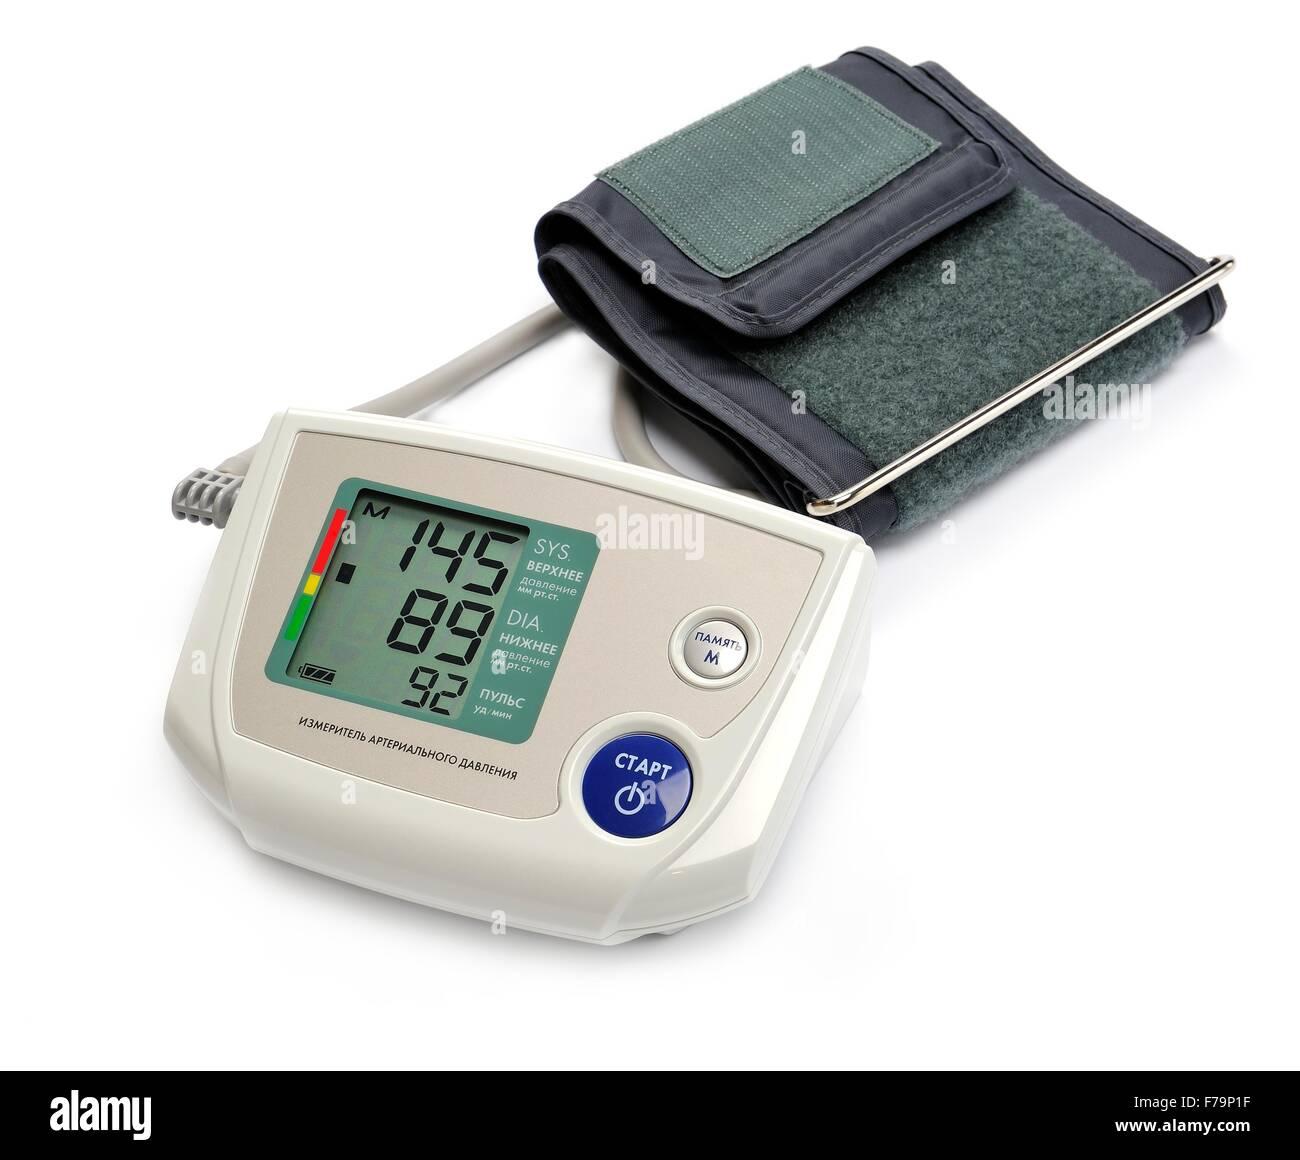 Tonometer - Digital blood pressure monitor on white background - Stock Image